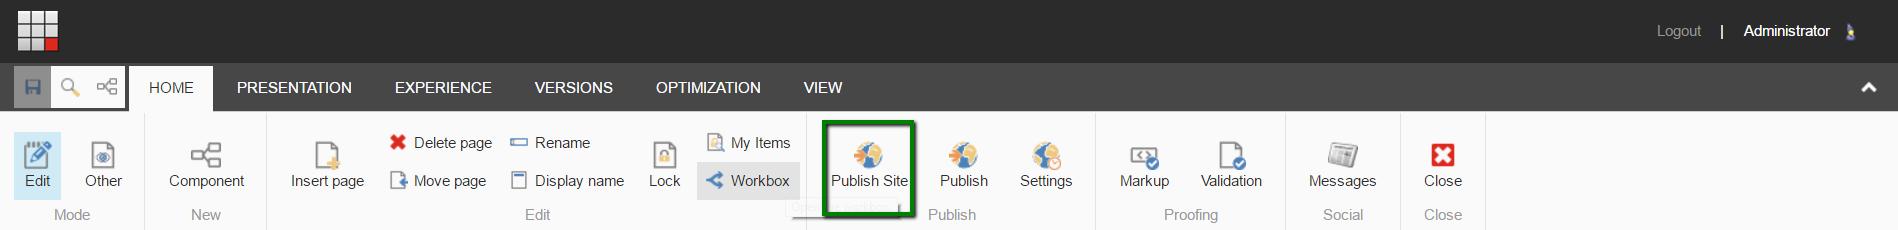 sitecore experience editor documentation